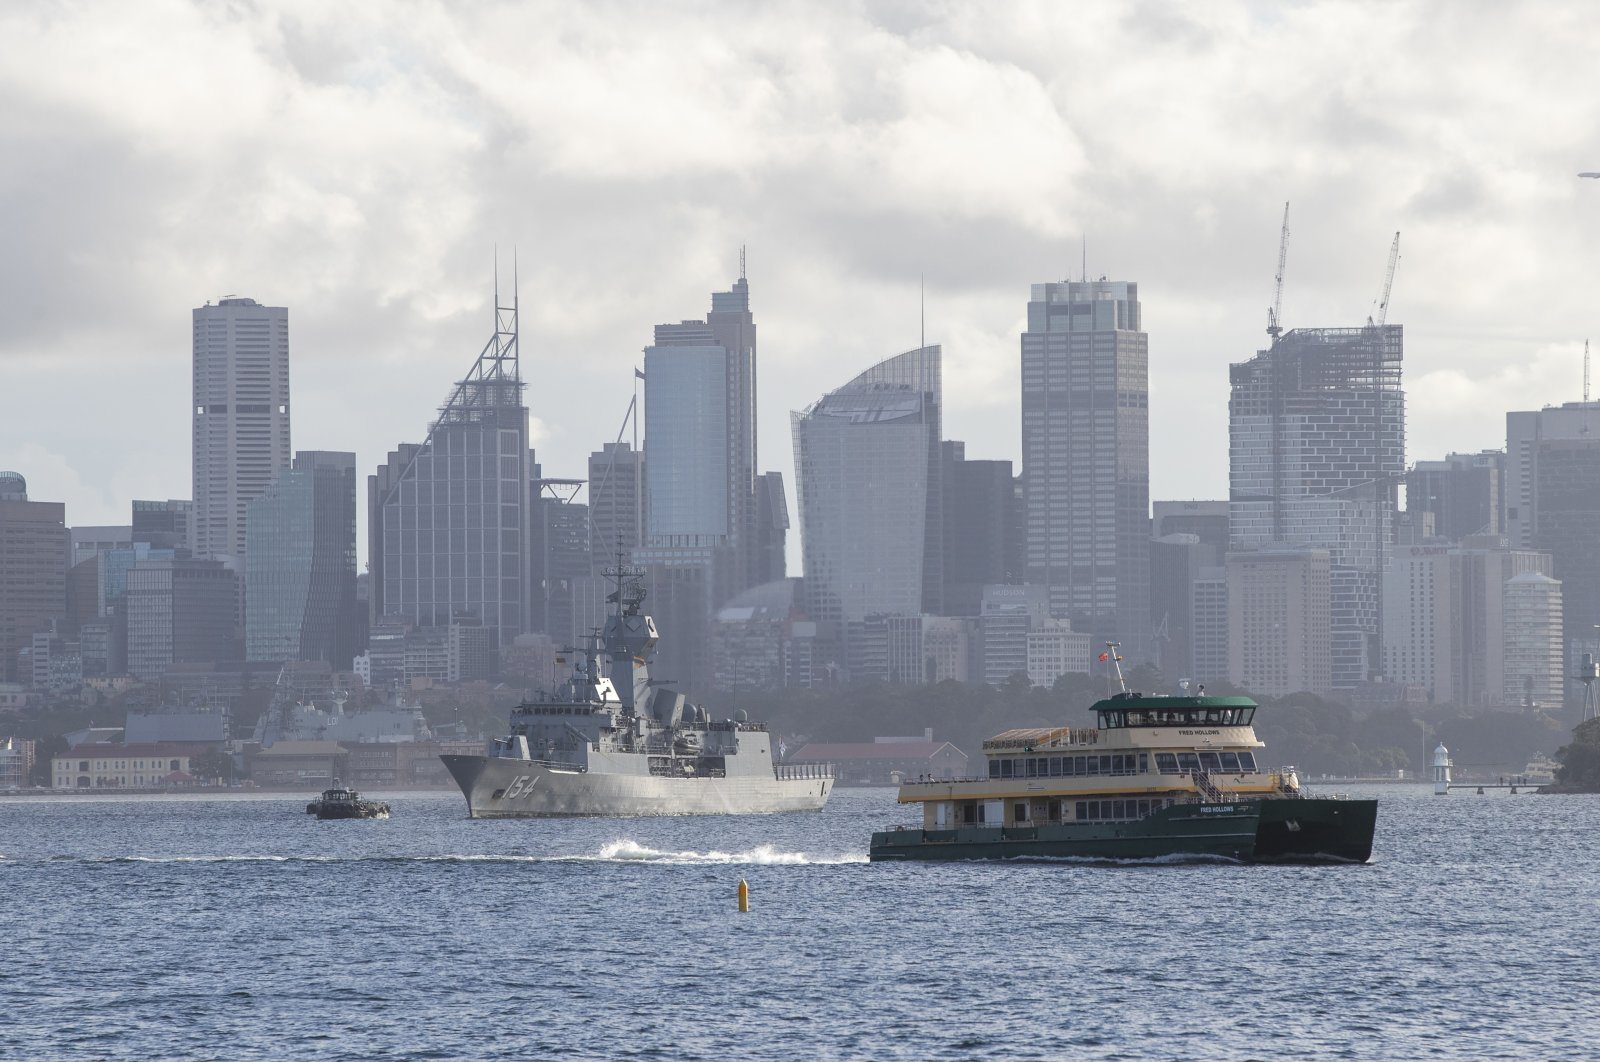 A ferry sails across the Sydney harbor past the HMAS Arunta, an Anzac-class frigate of the Royal Australian Navy, moored in Sydney, Australia, April 6, 2021.